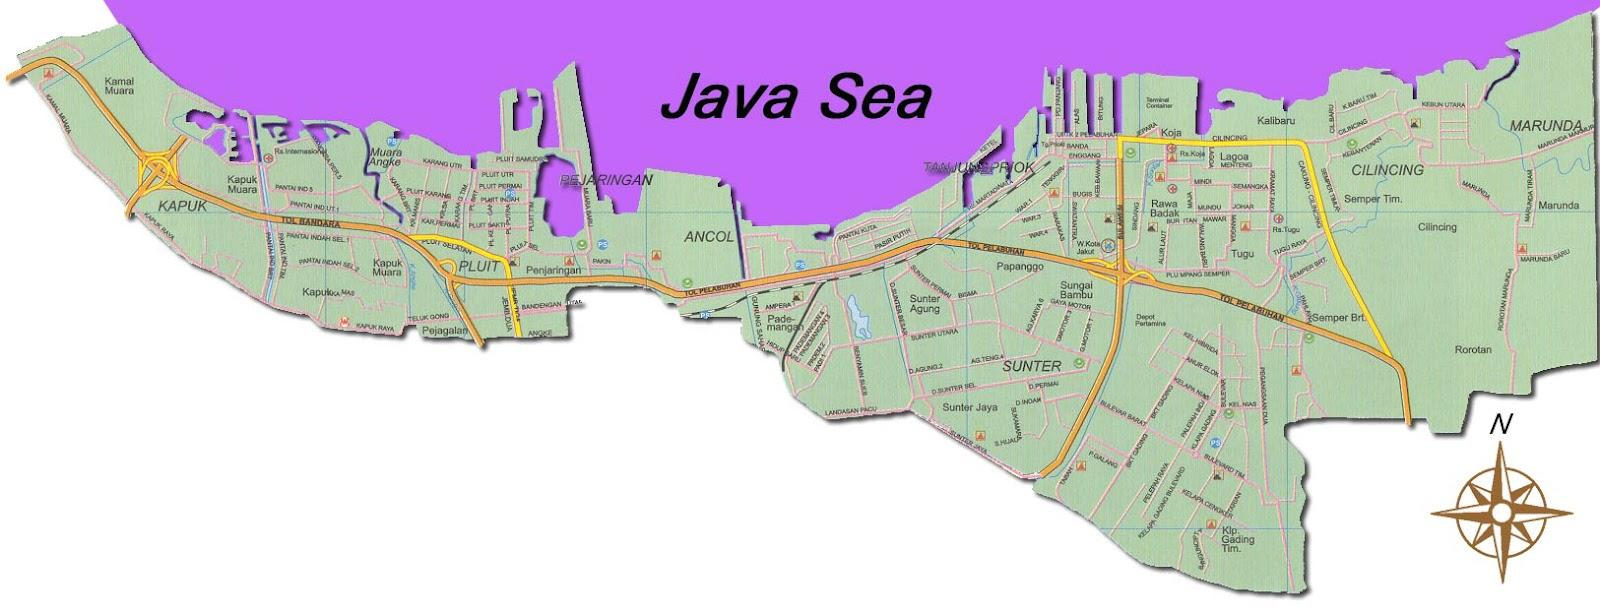 Data Statistik Kependudukan Jakarta Utara Gambaran Umum Kota Administrasi Dunia